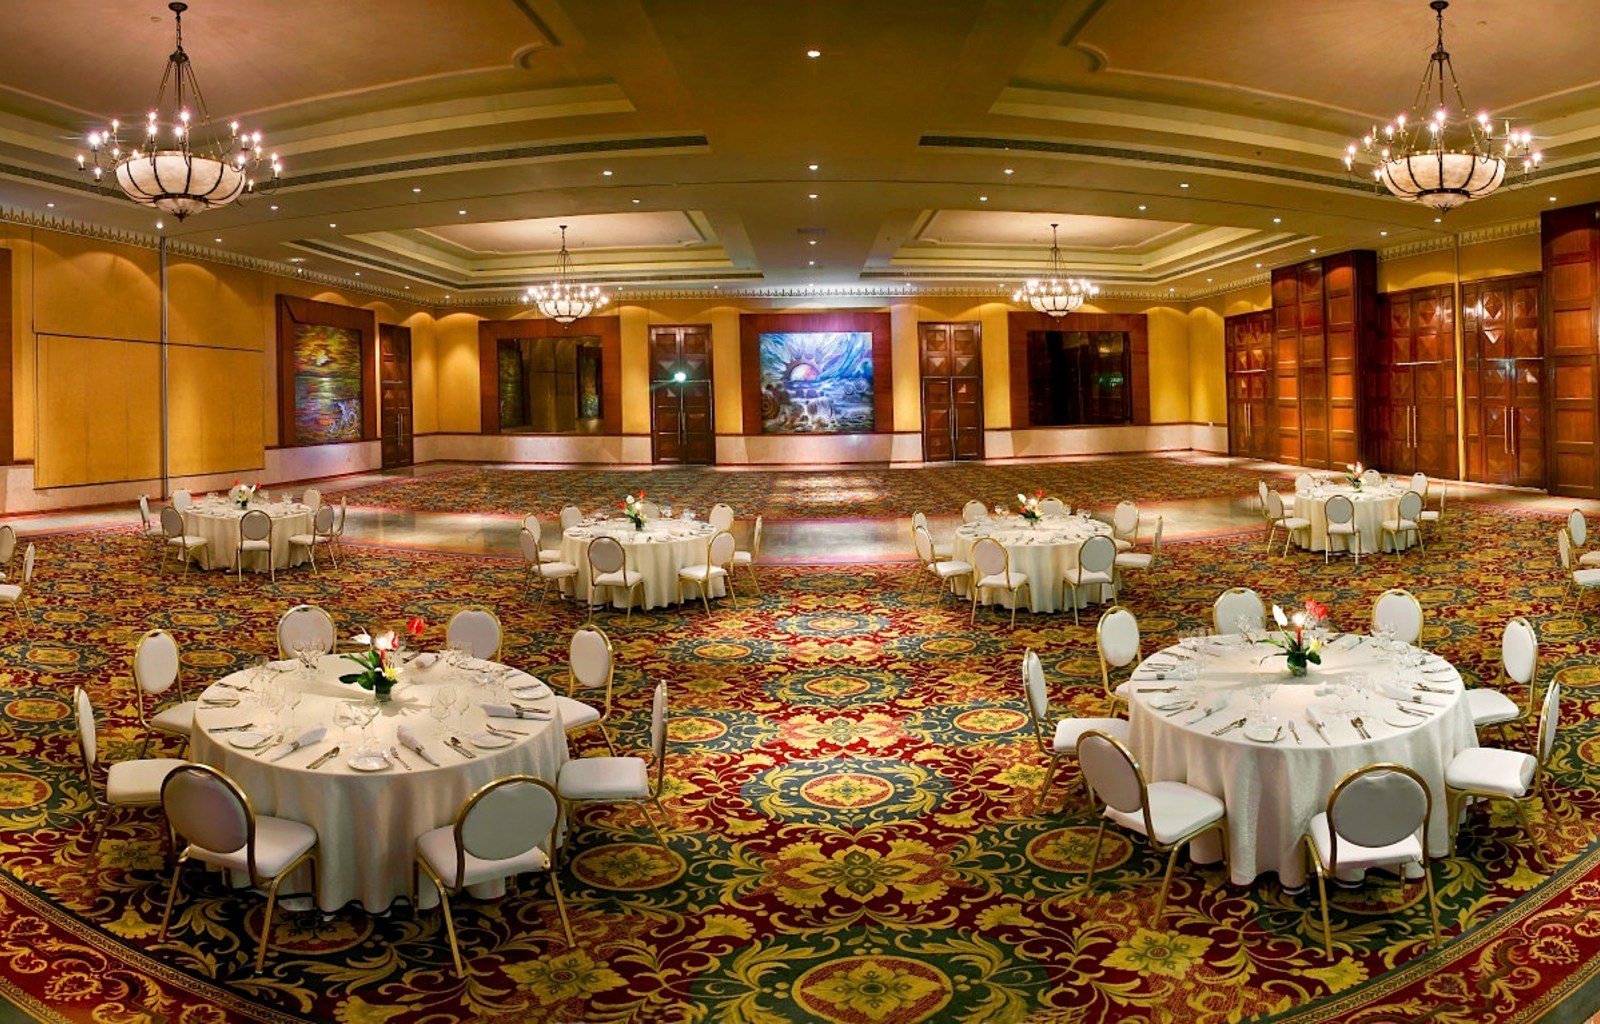 Most Impressive 5 Star Hotels In Andheri